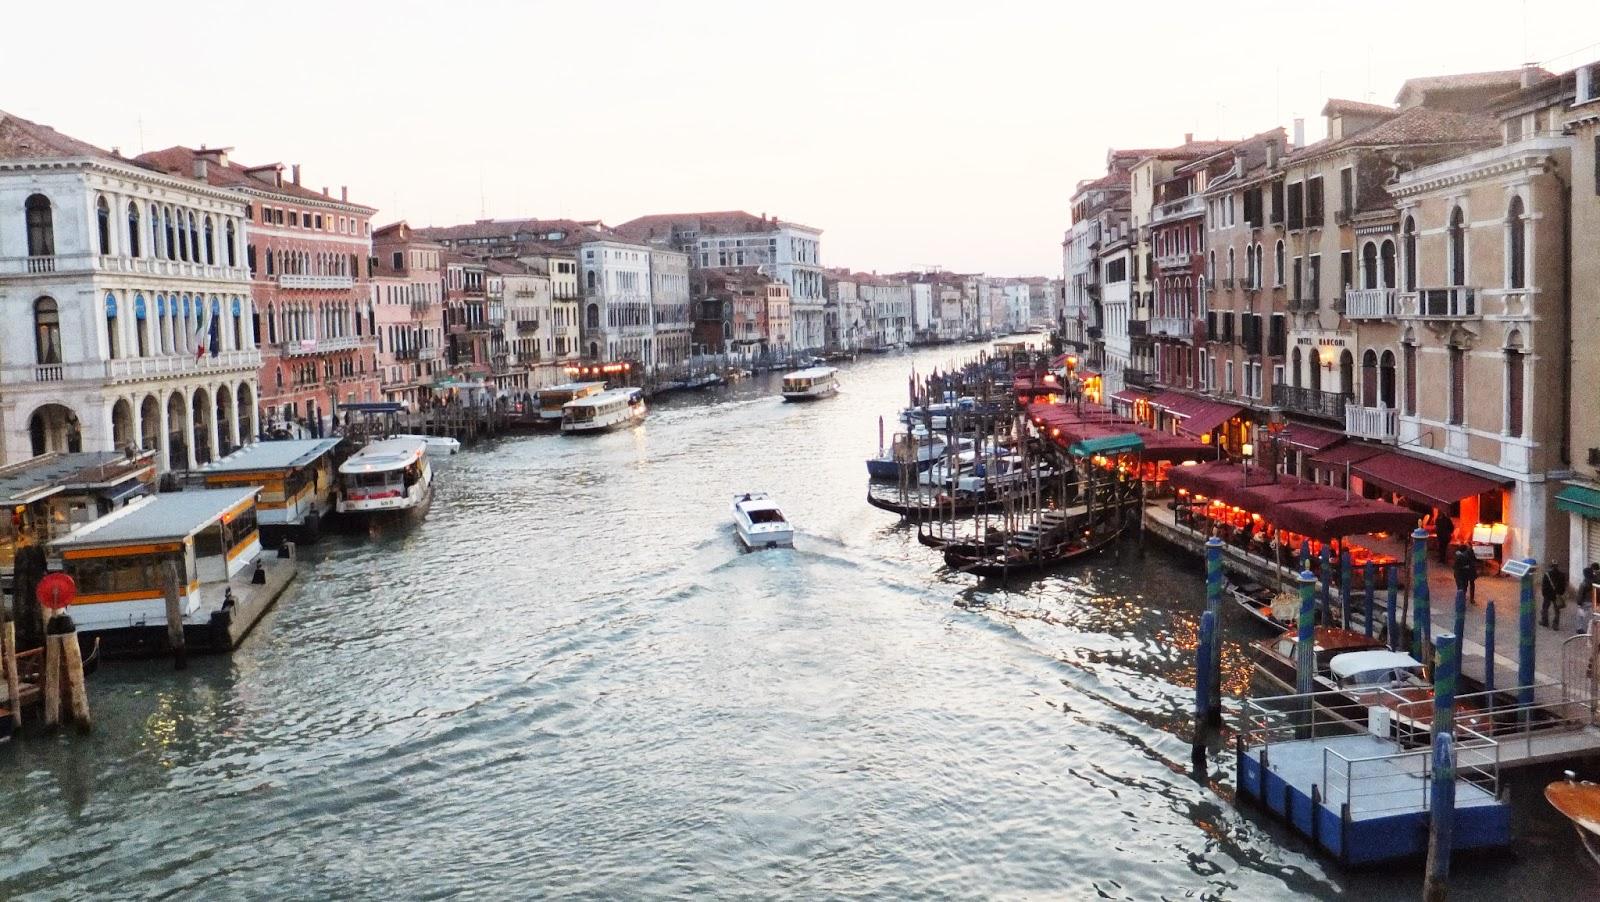 Ponte del Rialto, Venecia, Venezia, Italia, Elisa N, Blog de Viajes, Lifestyle, Travel